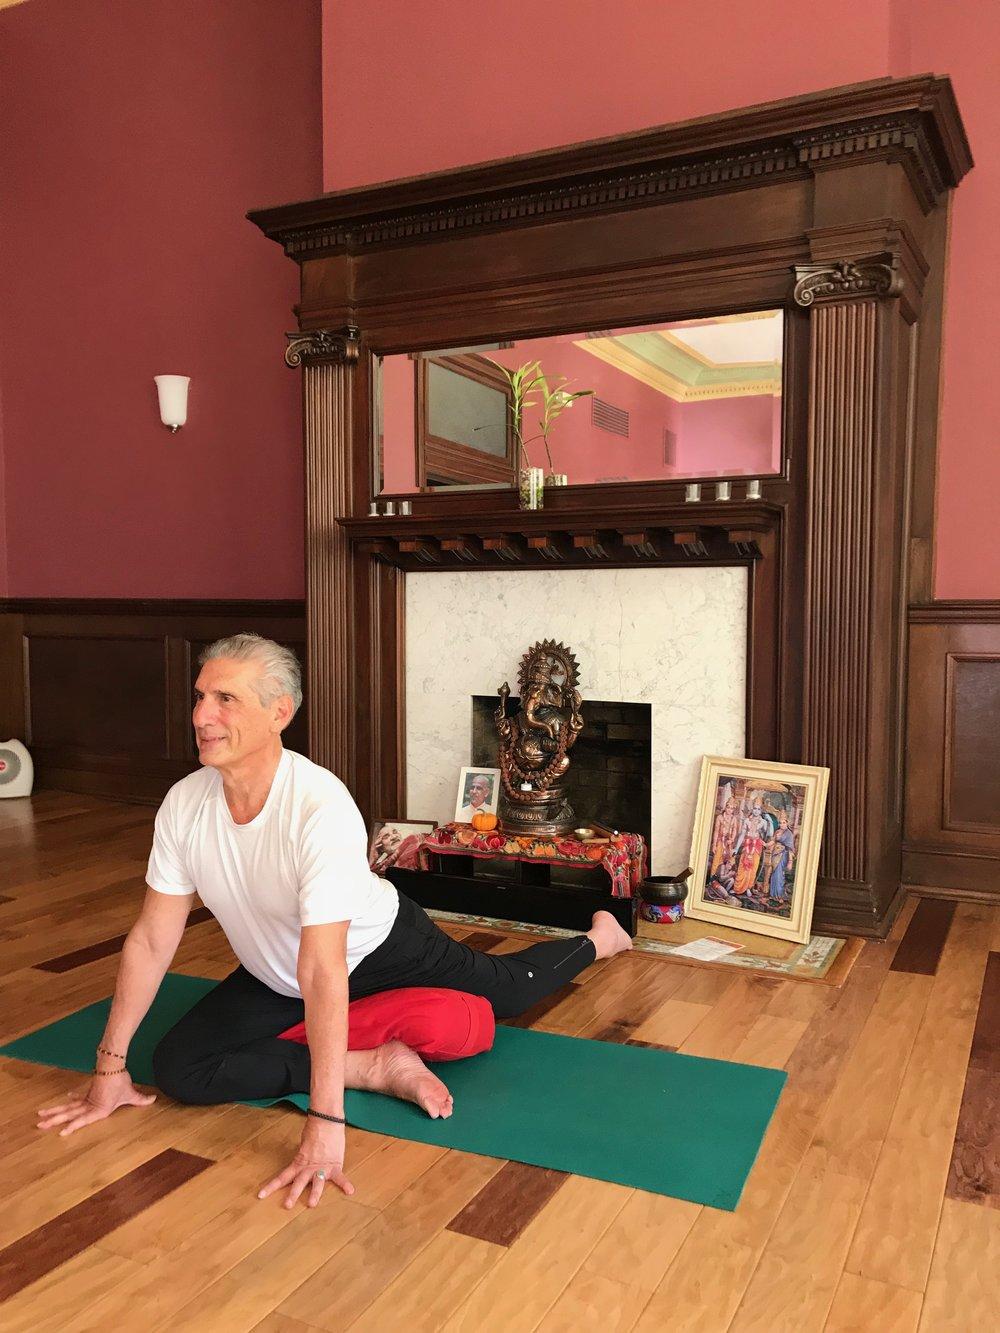 Yoga Proud PidgeonIMG_3313.jpg*.jpg